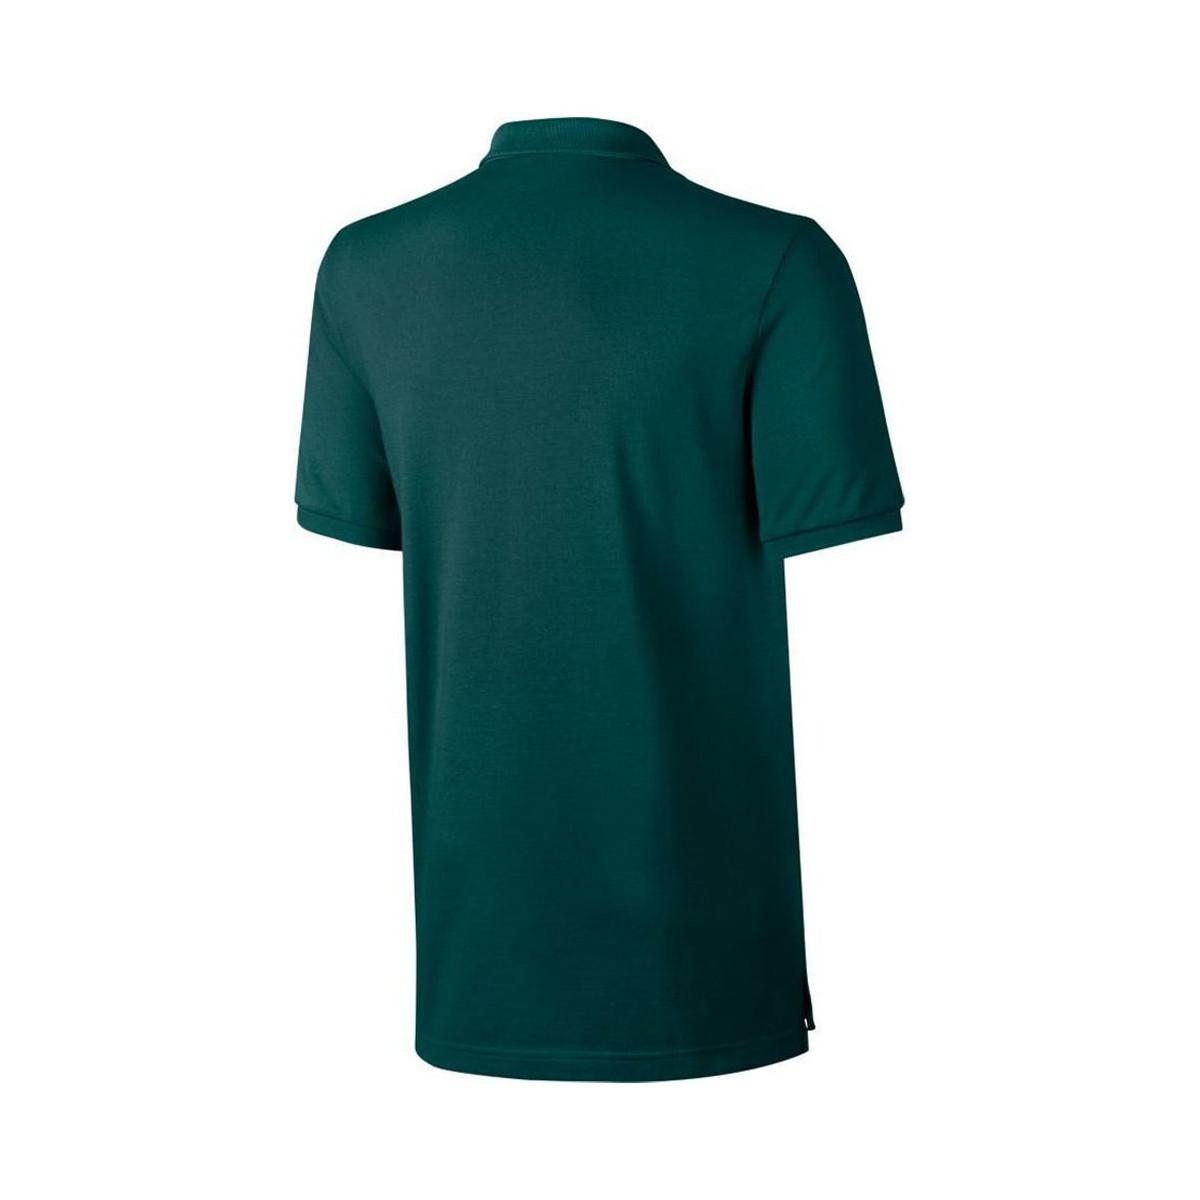 Nike 2017 2018 Man City Authentic Grand Slam Polo Shirt Outdoor